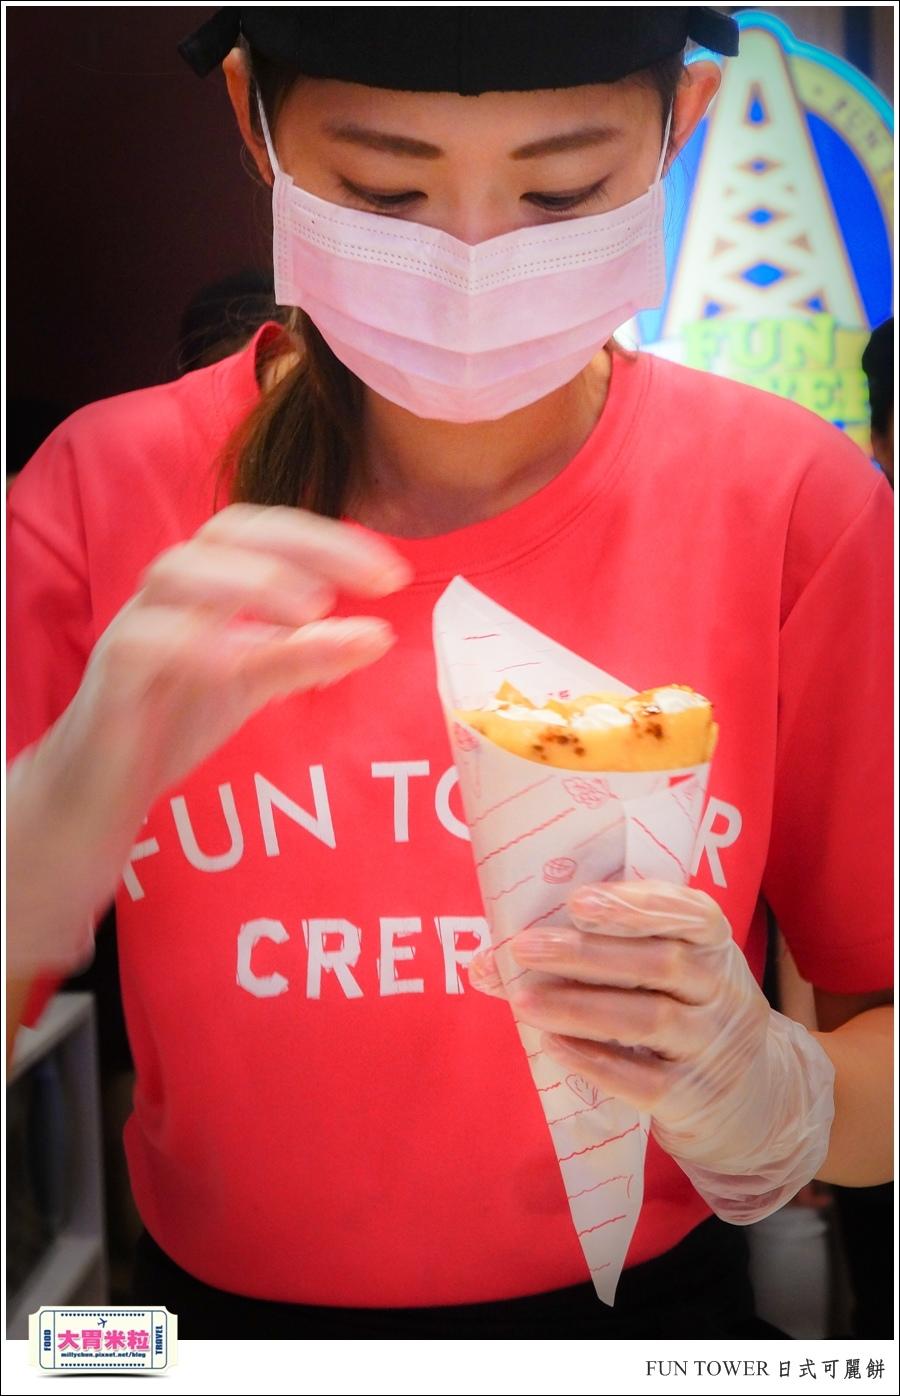 FUN TOWER日式可麗餅(高雄明華店)@高雄可麗餅甜點推薦@大胃米粒0026.jpg